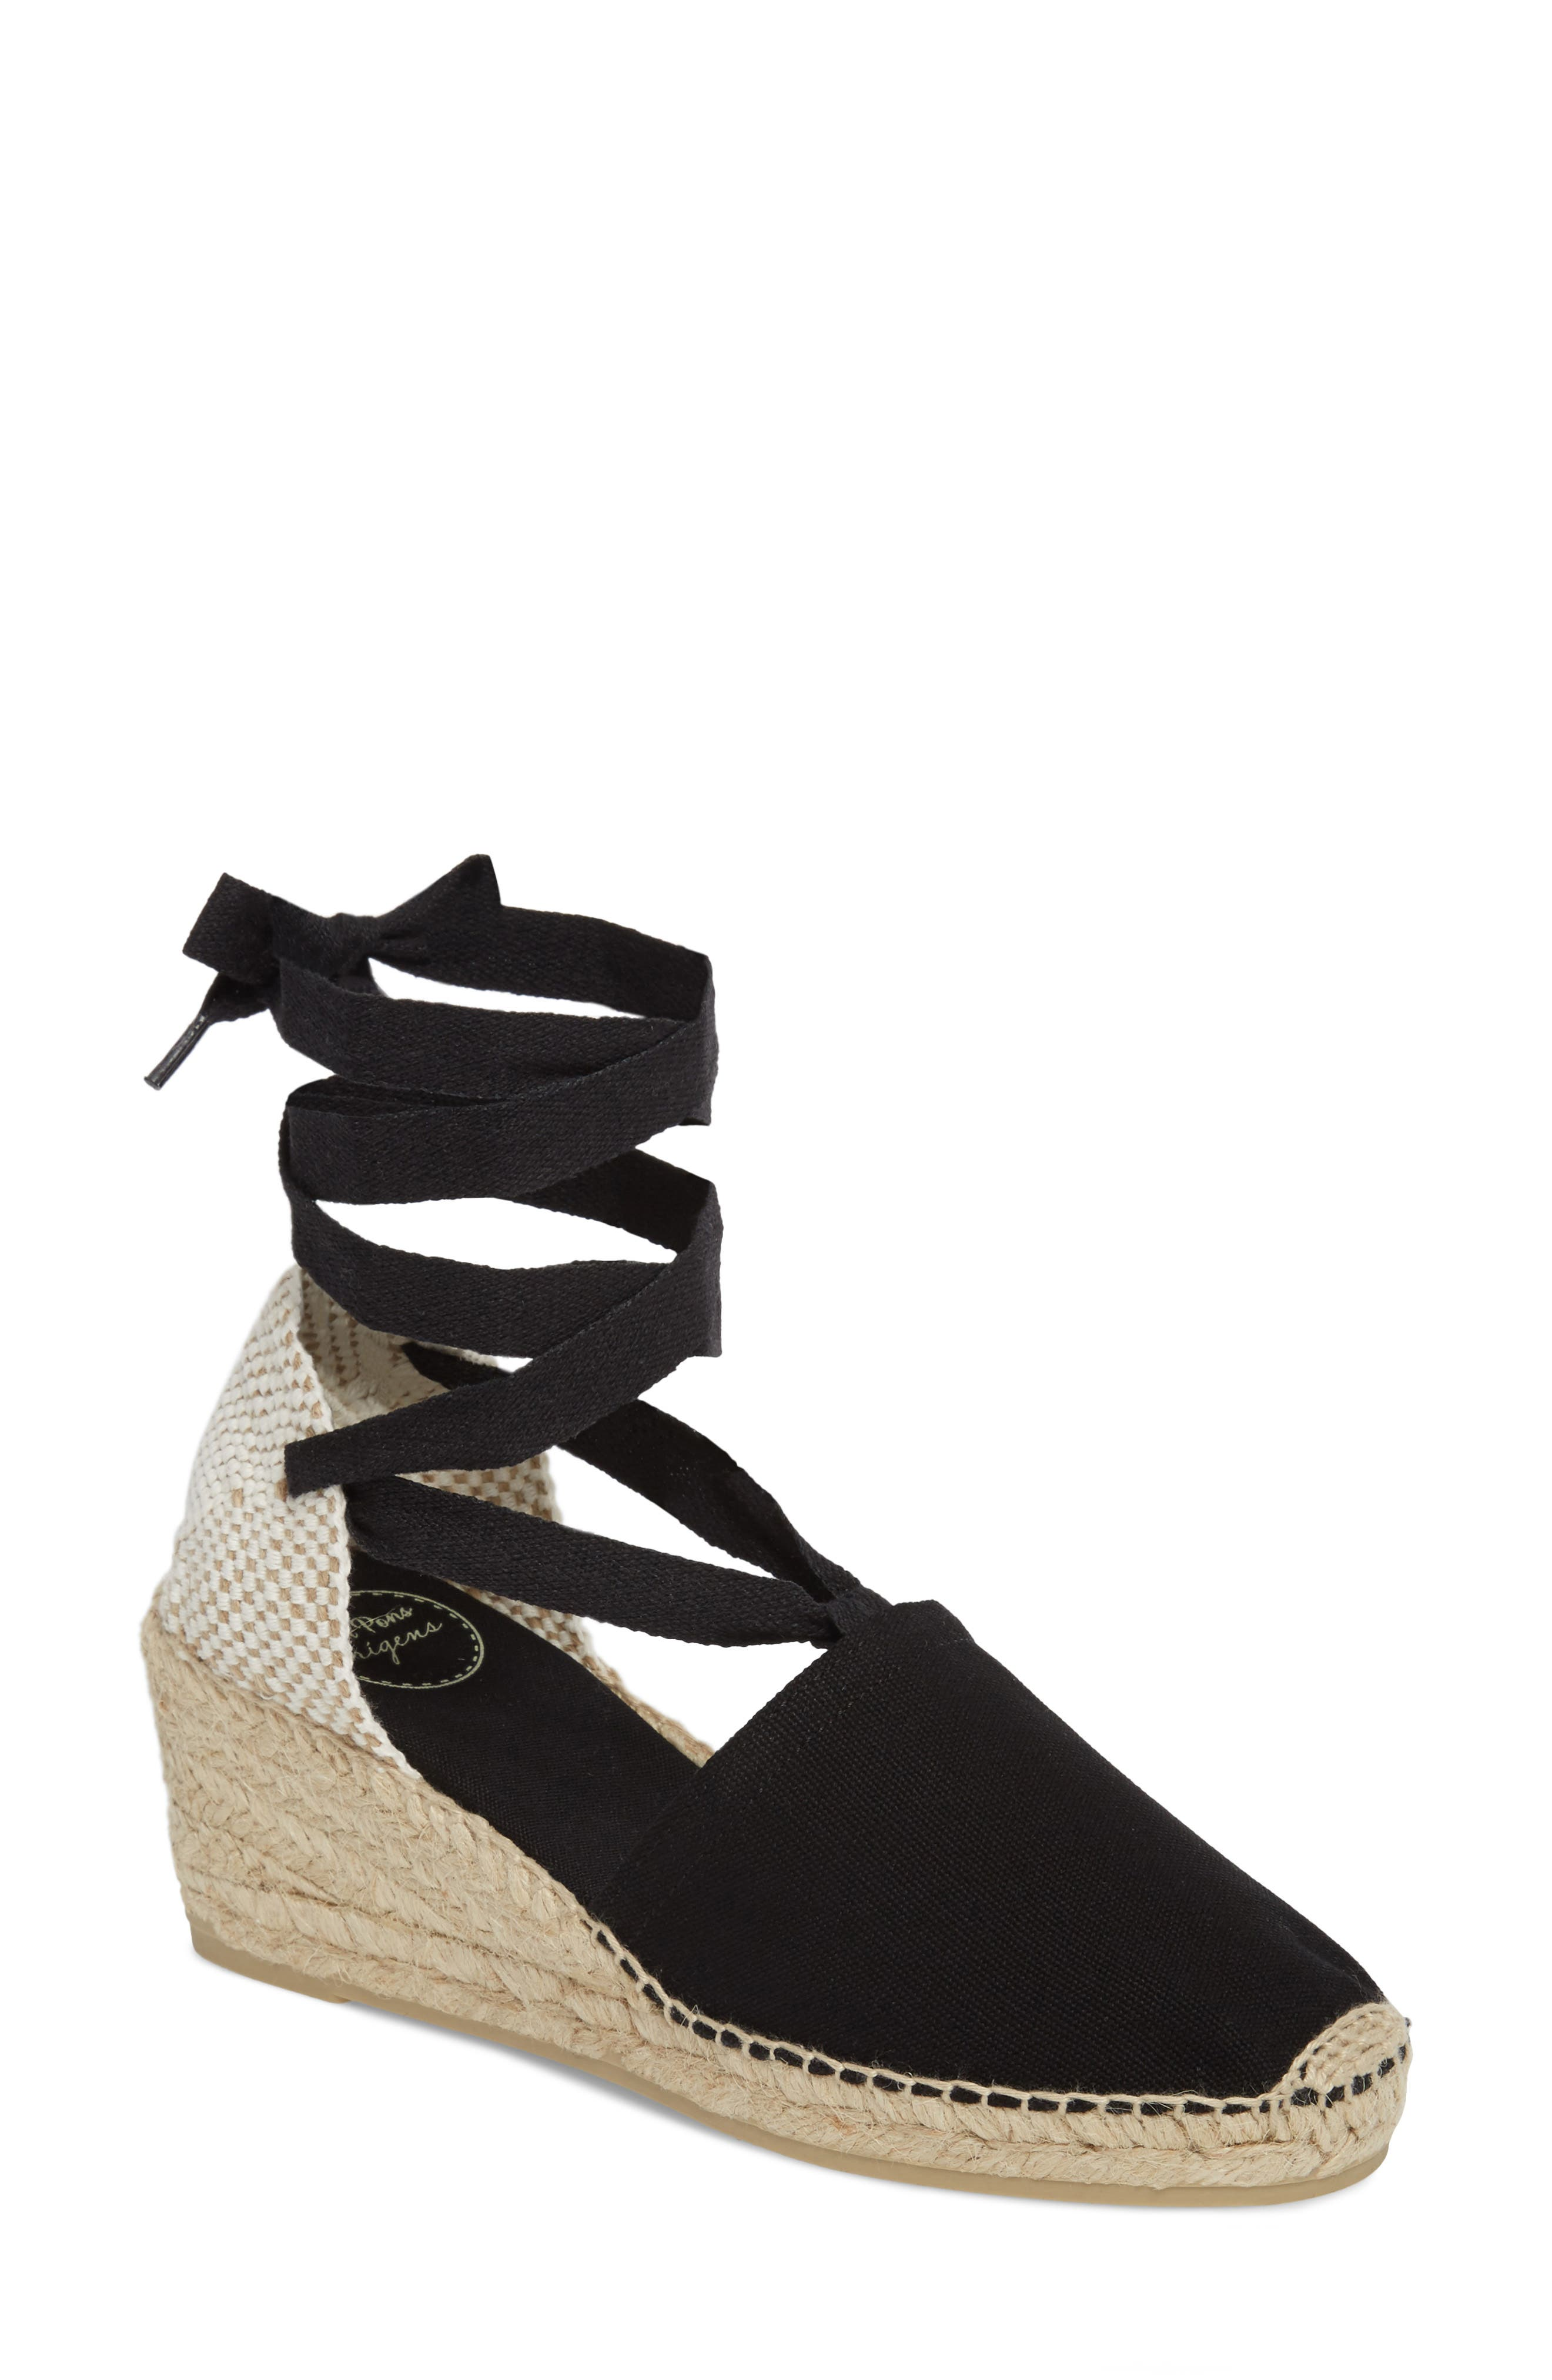 Valencia Wraparound Espadrille Wedge, Main, color, BLACK FABRIC